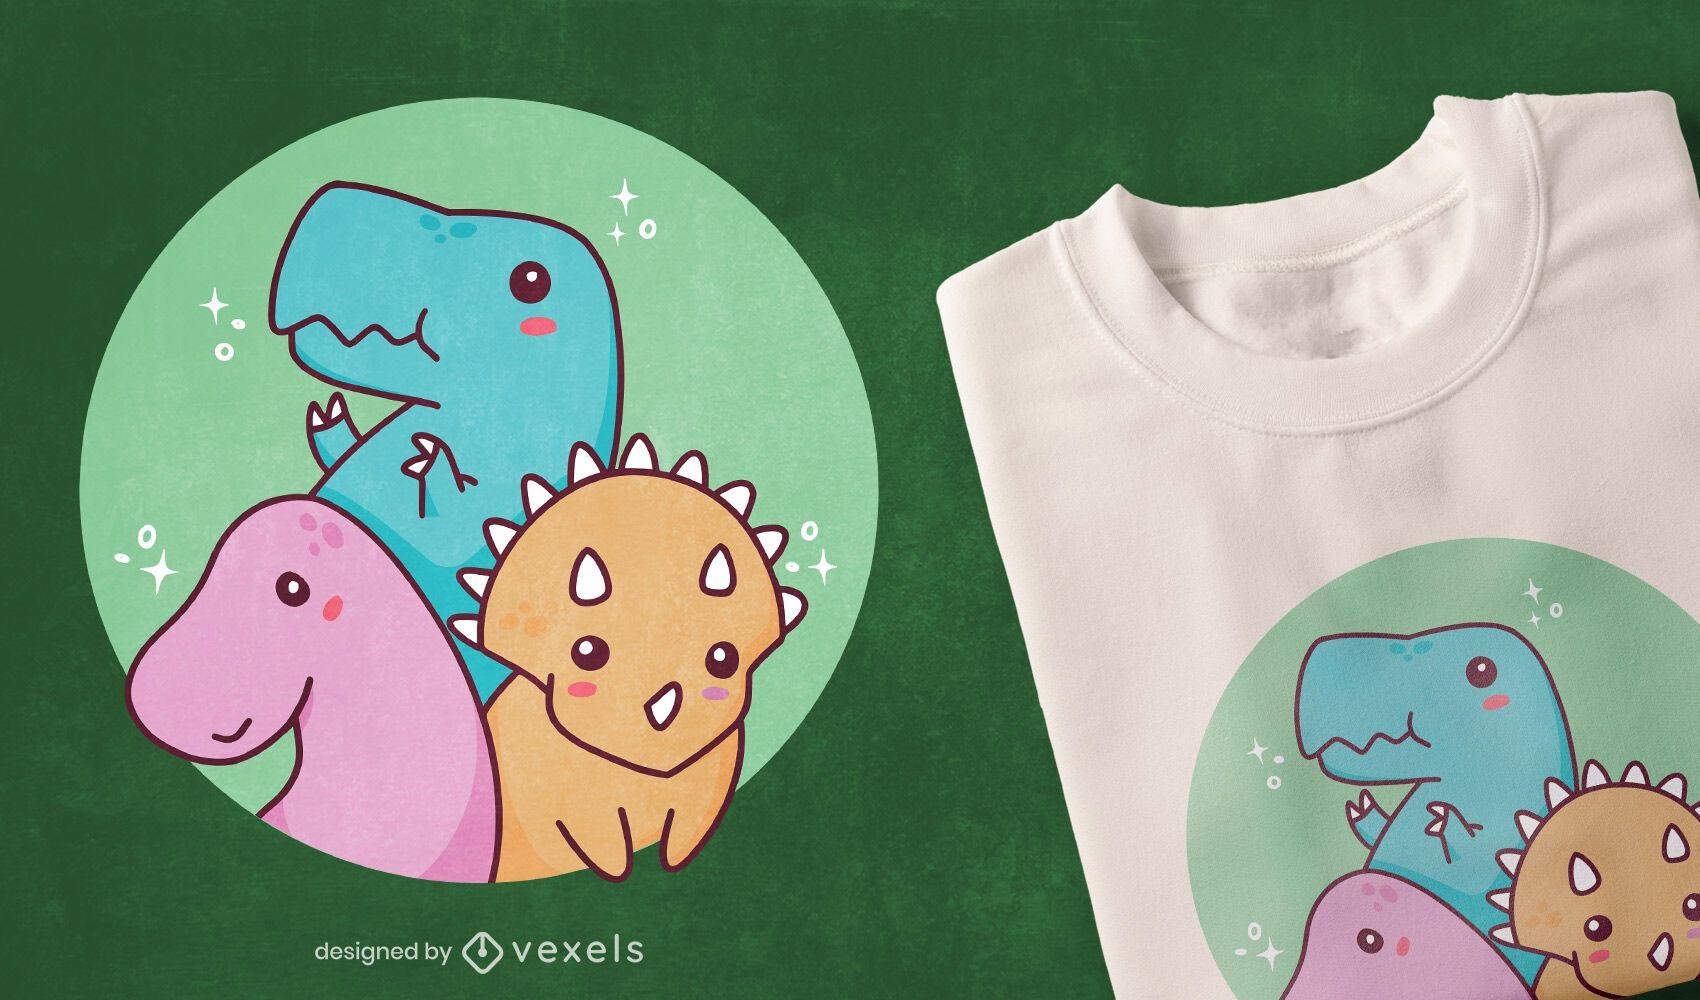 Dise?o de camiseta de dinosaurios beb? lindo